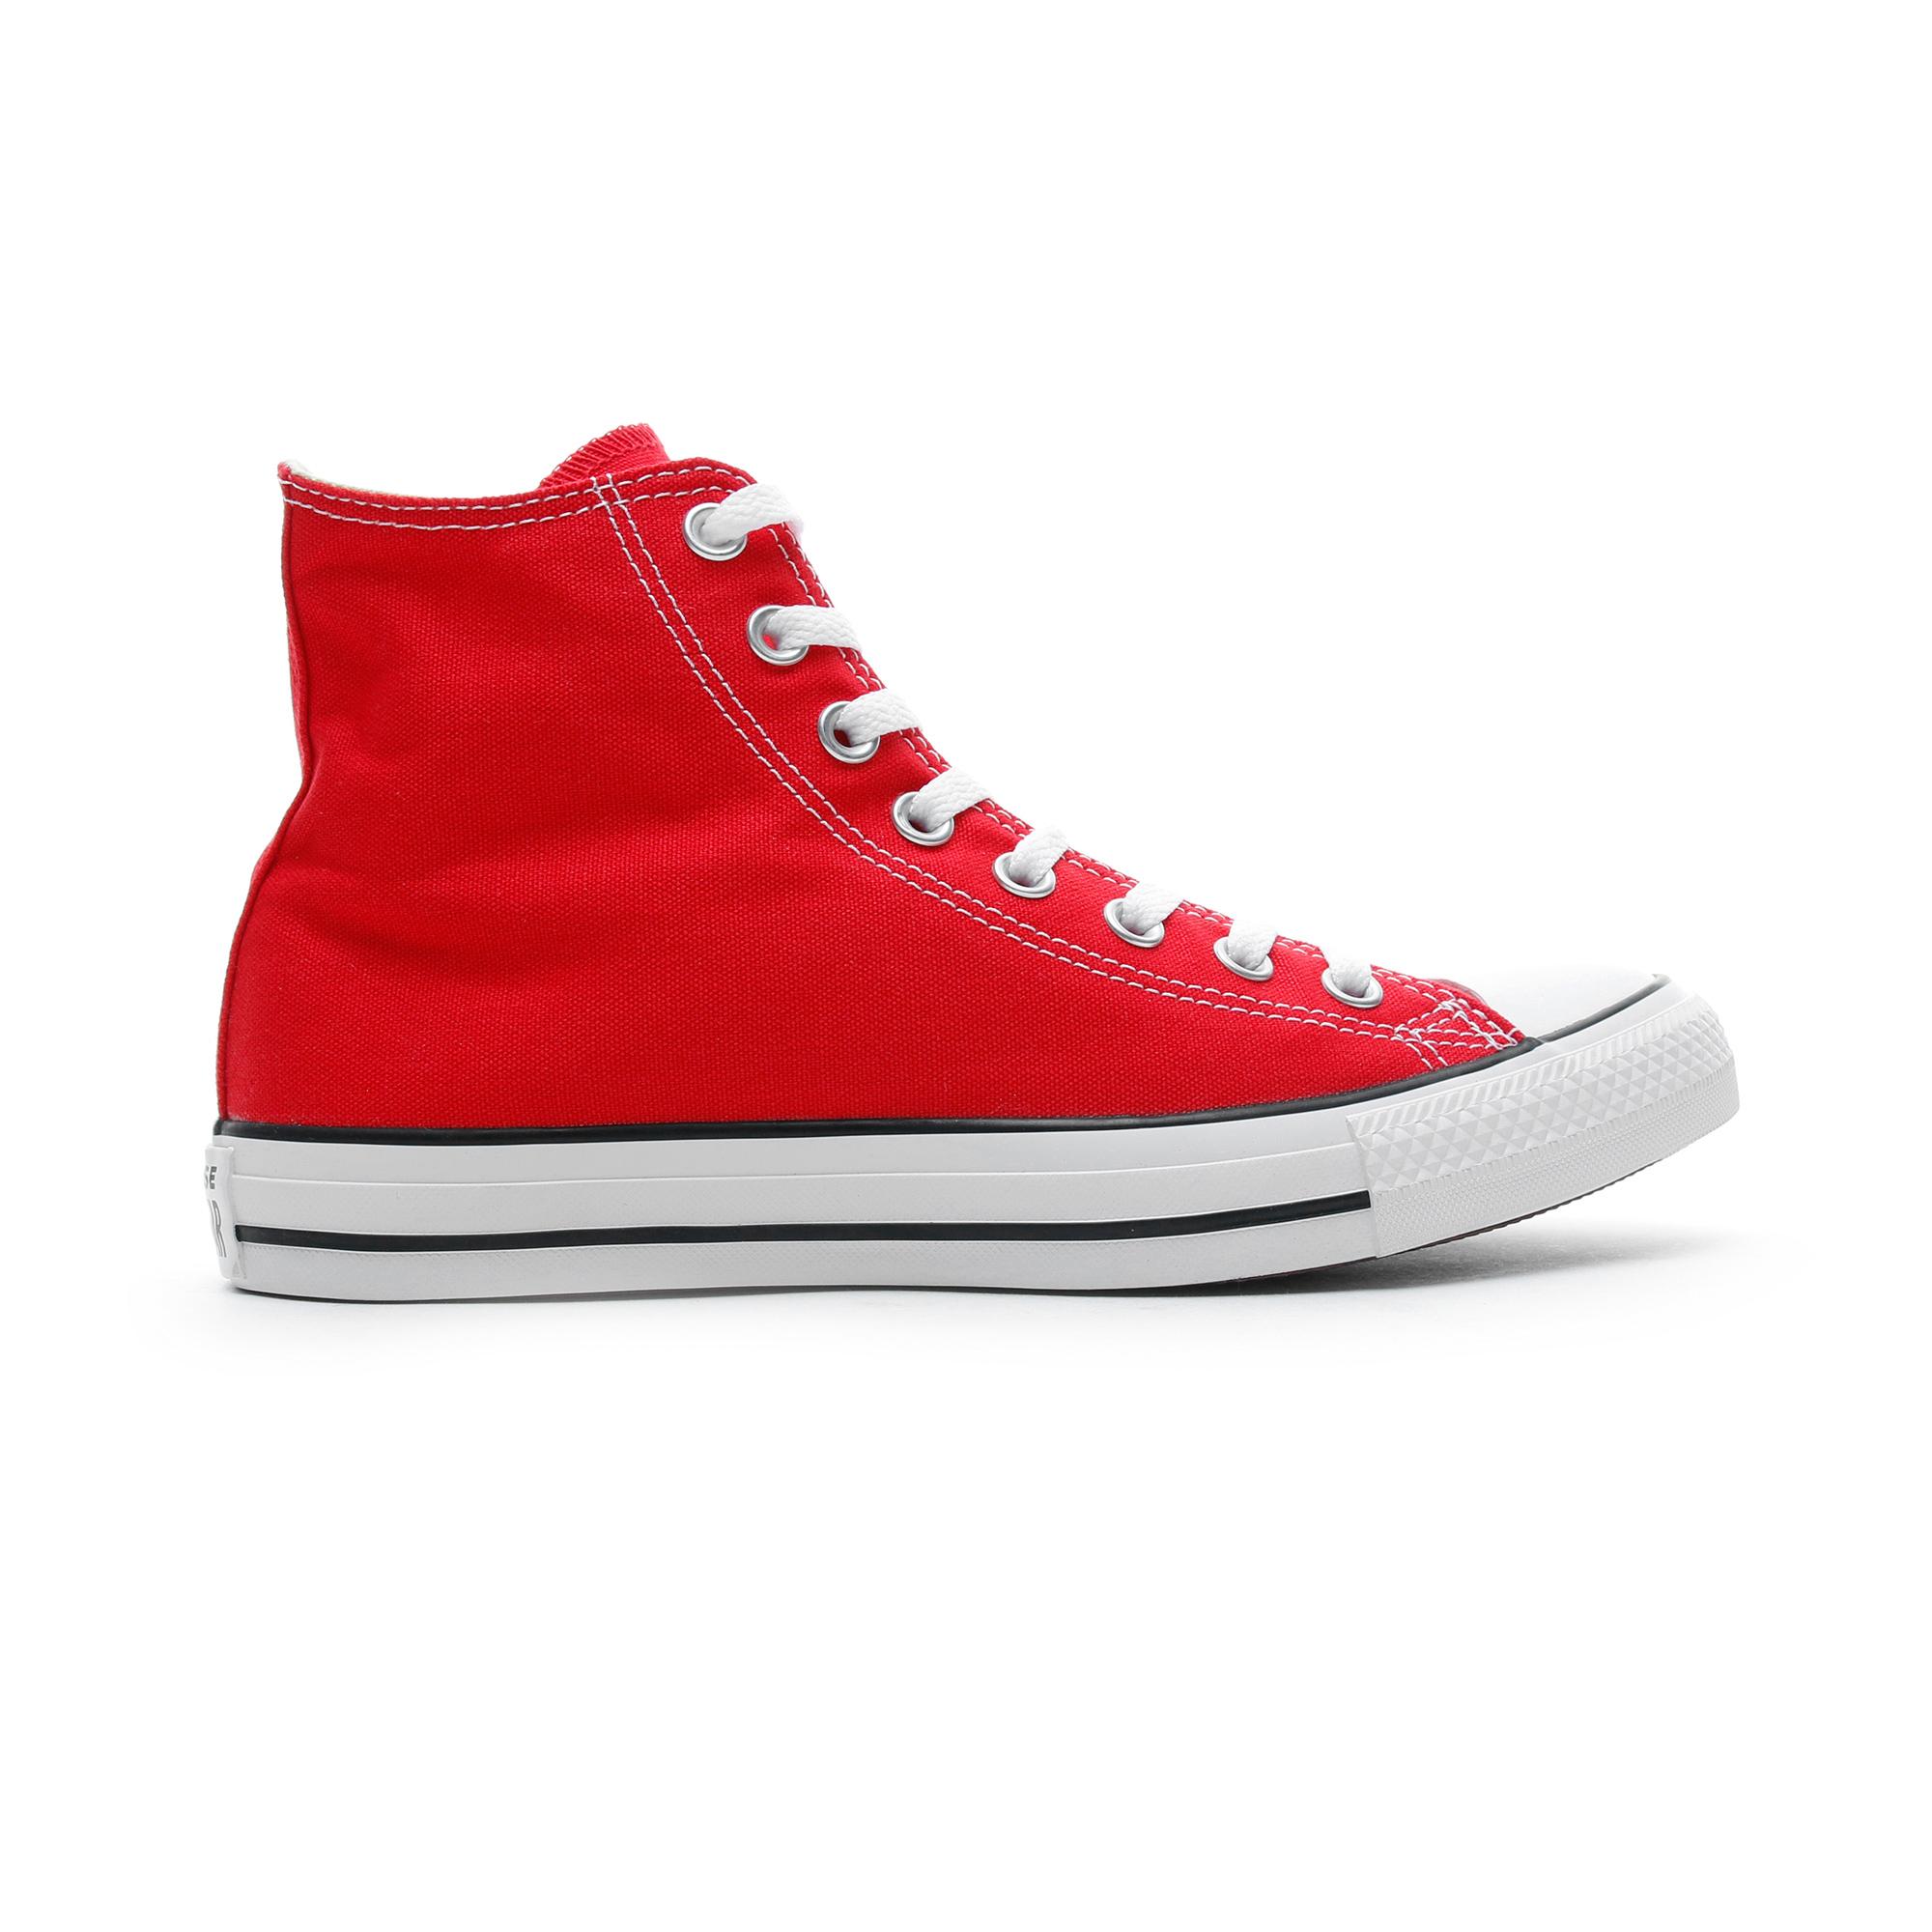 Converse Chuck Taylor All Star Hi Unisex Kırmızı Sneaker